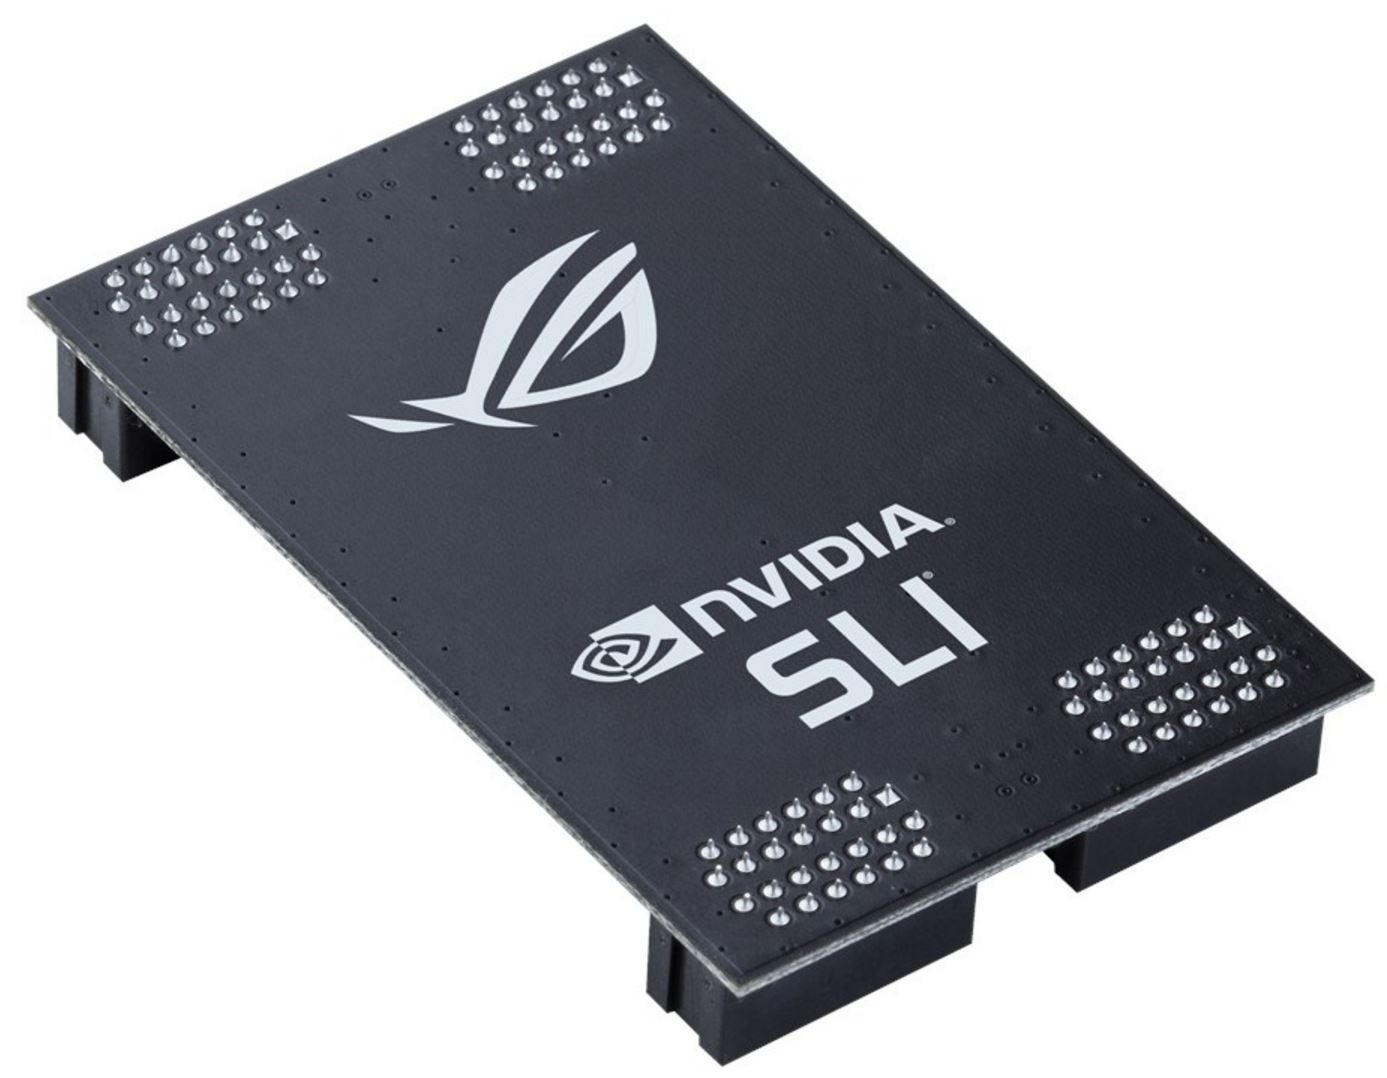 Motherboard - The world leader in motherboard design